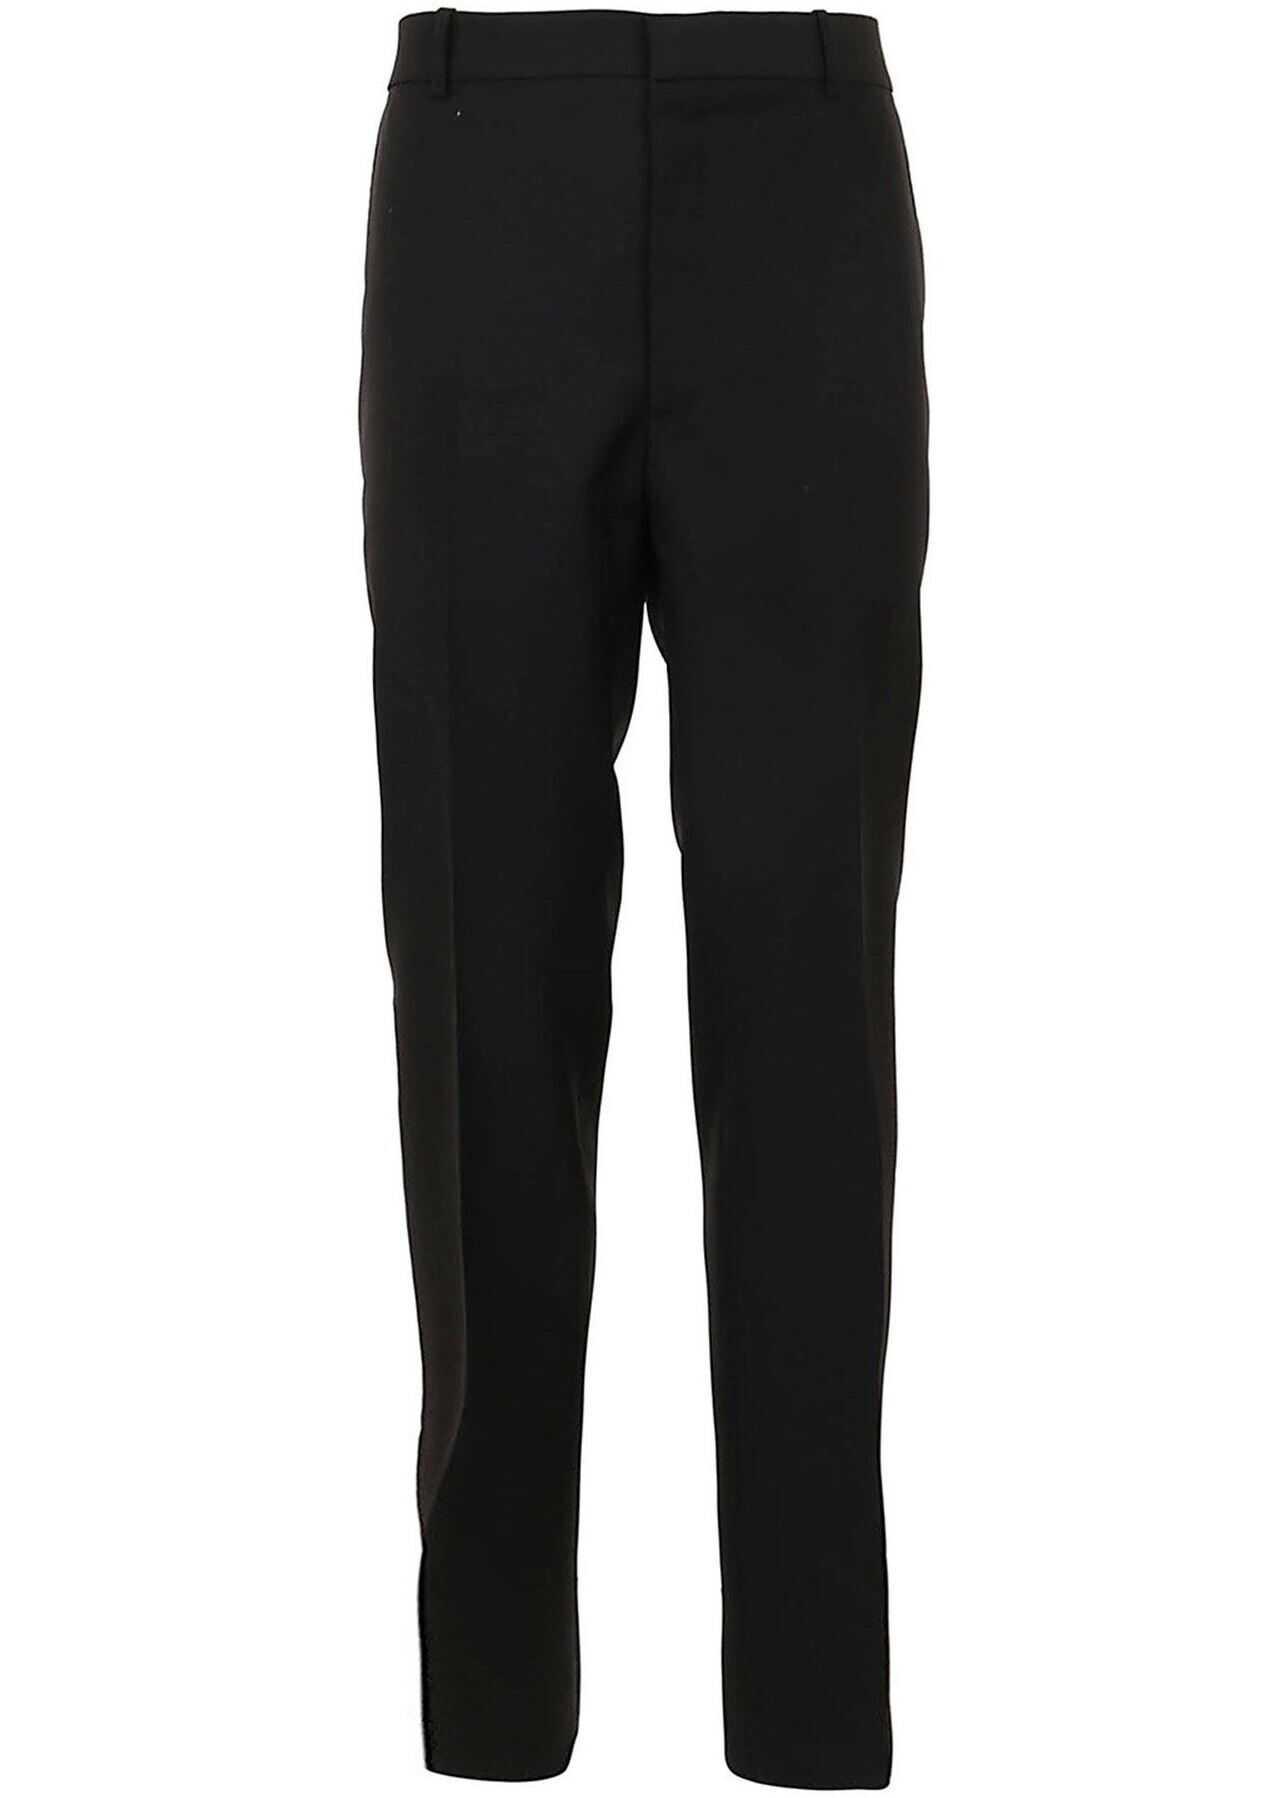 Alexander McQueen Wool-Mohair Blend Trousers In Black Black imagine